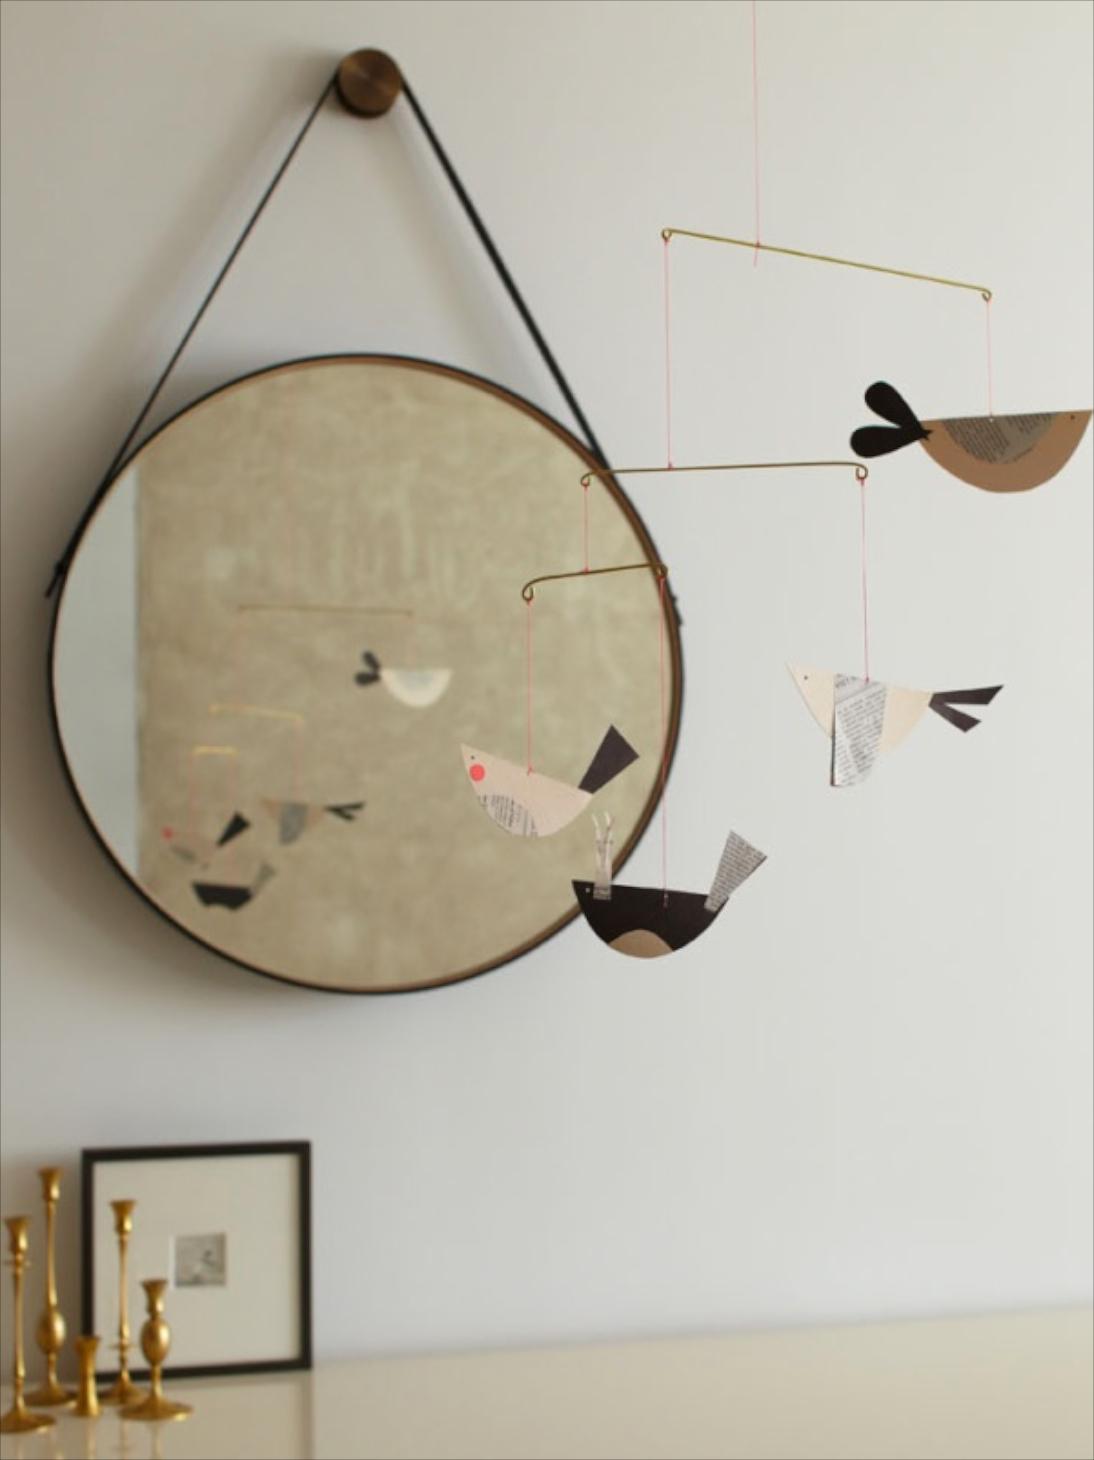 Circular convex mirrors fourth floor walk up for Miroir concave